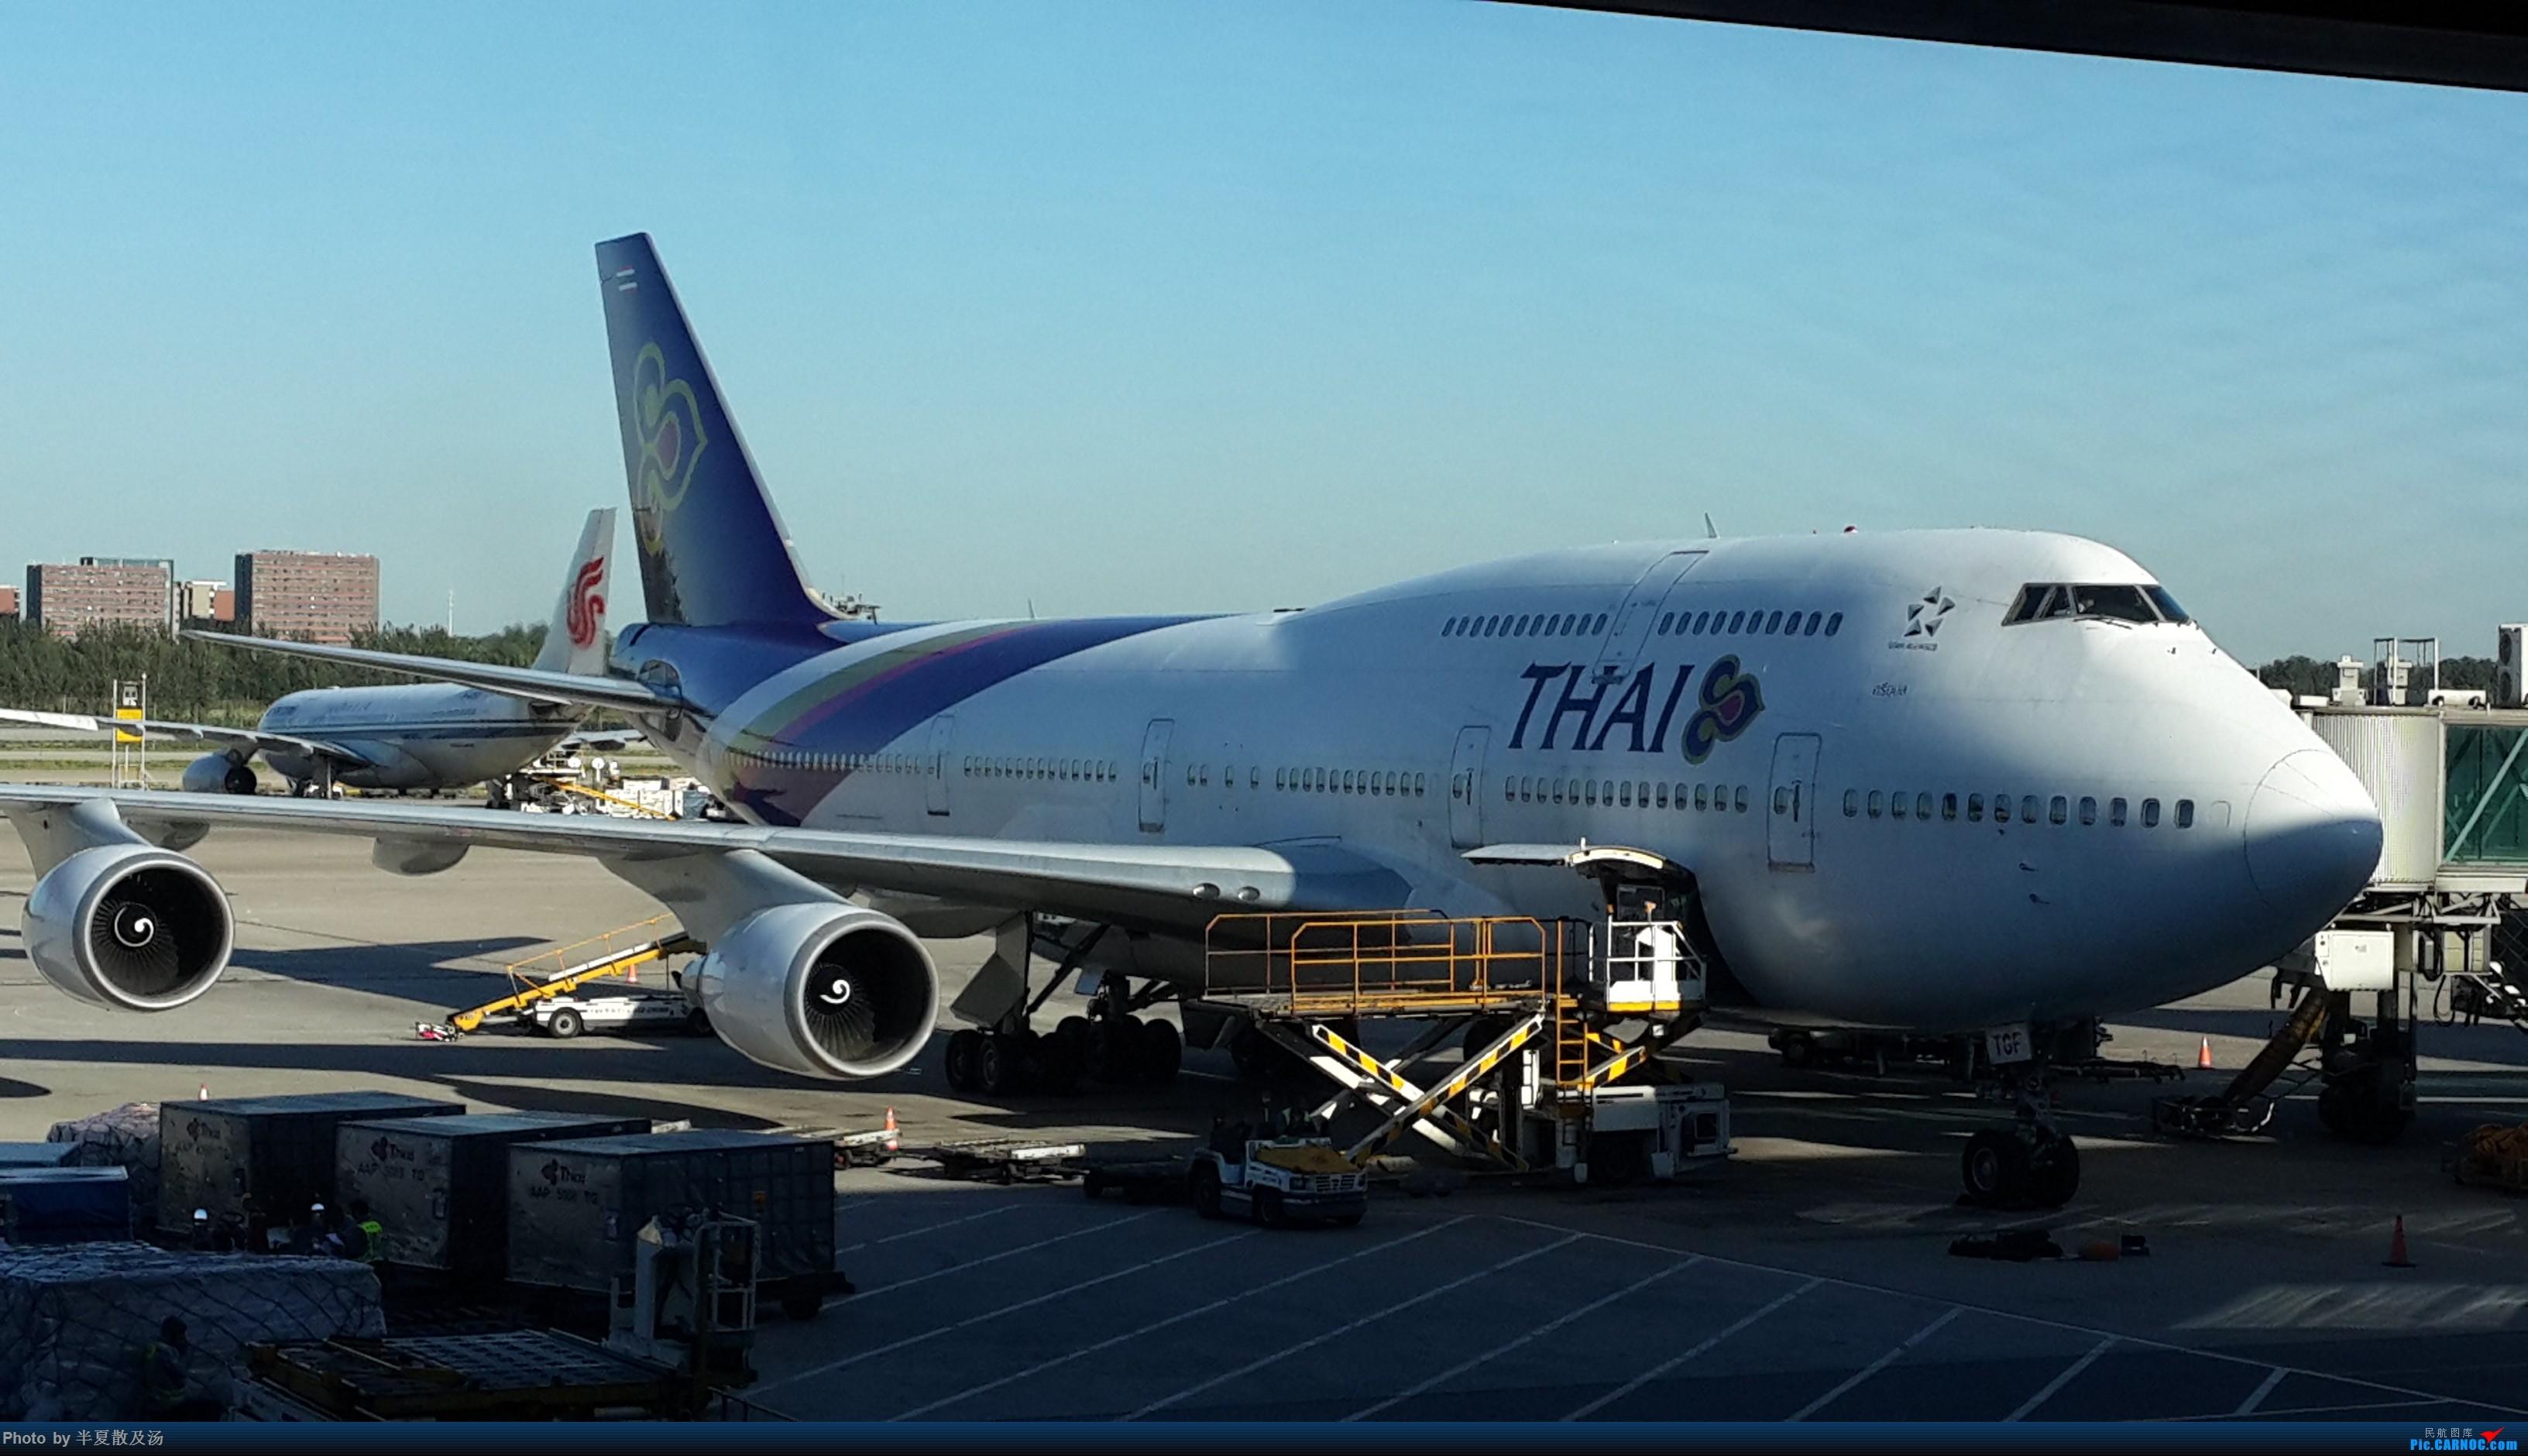 Re:[原创]A380主轮降温作业,道格拉斯抱轮车,747、330,多图 BOEING 747-400  中国北京首都国际机场